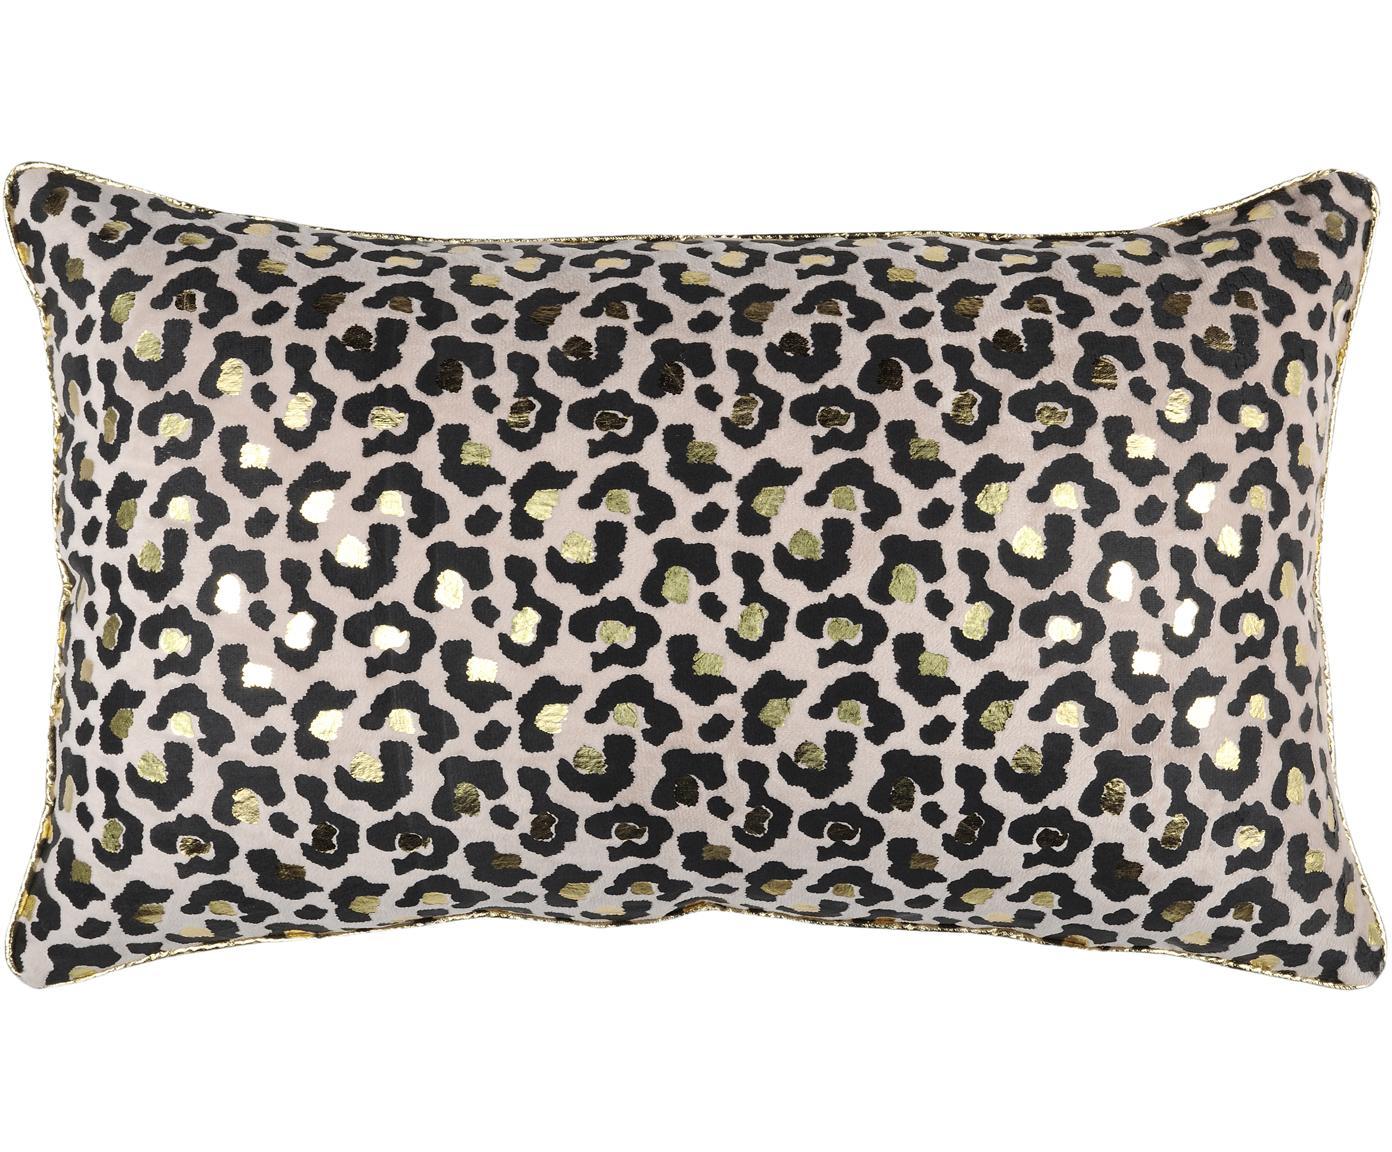 Kussen Jangal met luipaardpatroon  en goudkleurige details, met vulling, Polyester, Zwart, beige, goudkleurig, 30 x 50 cm